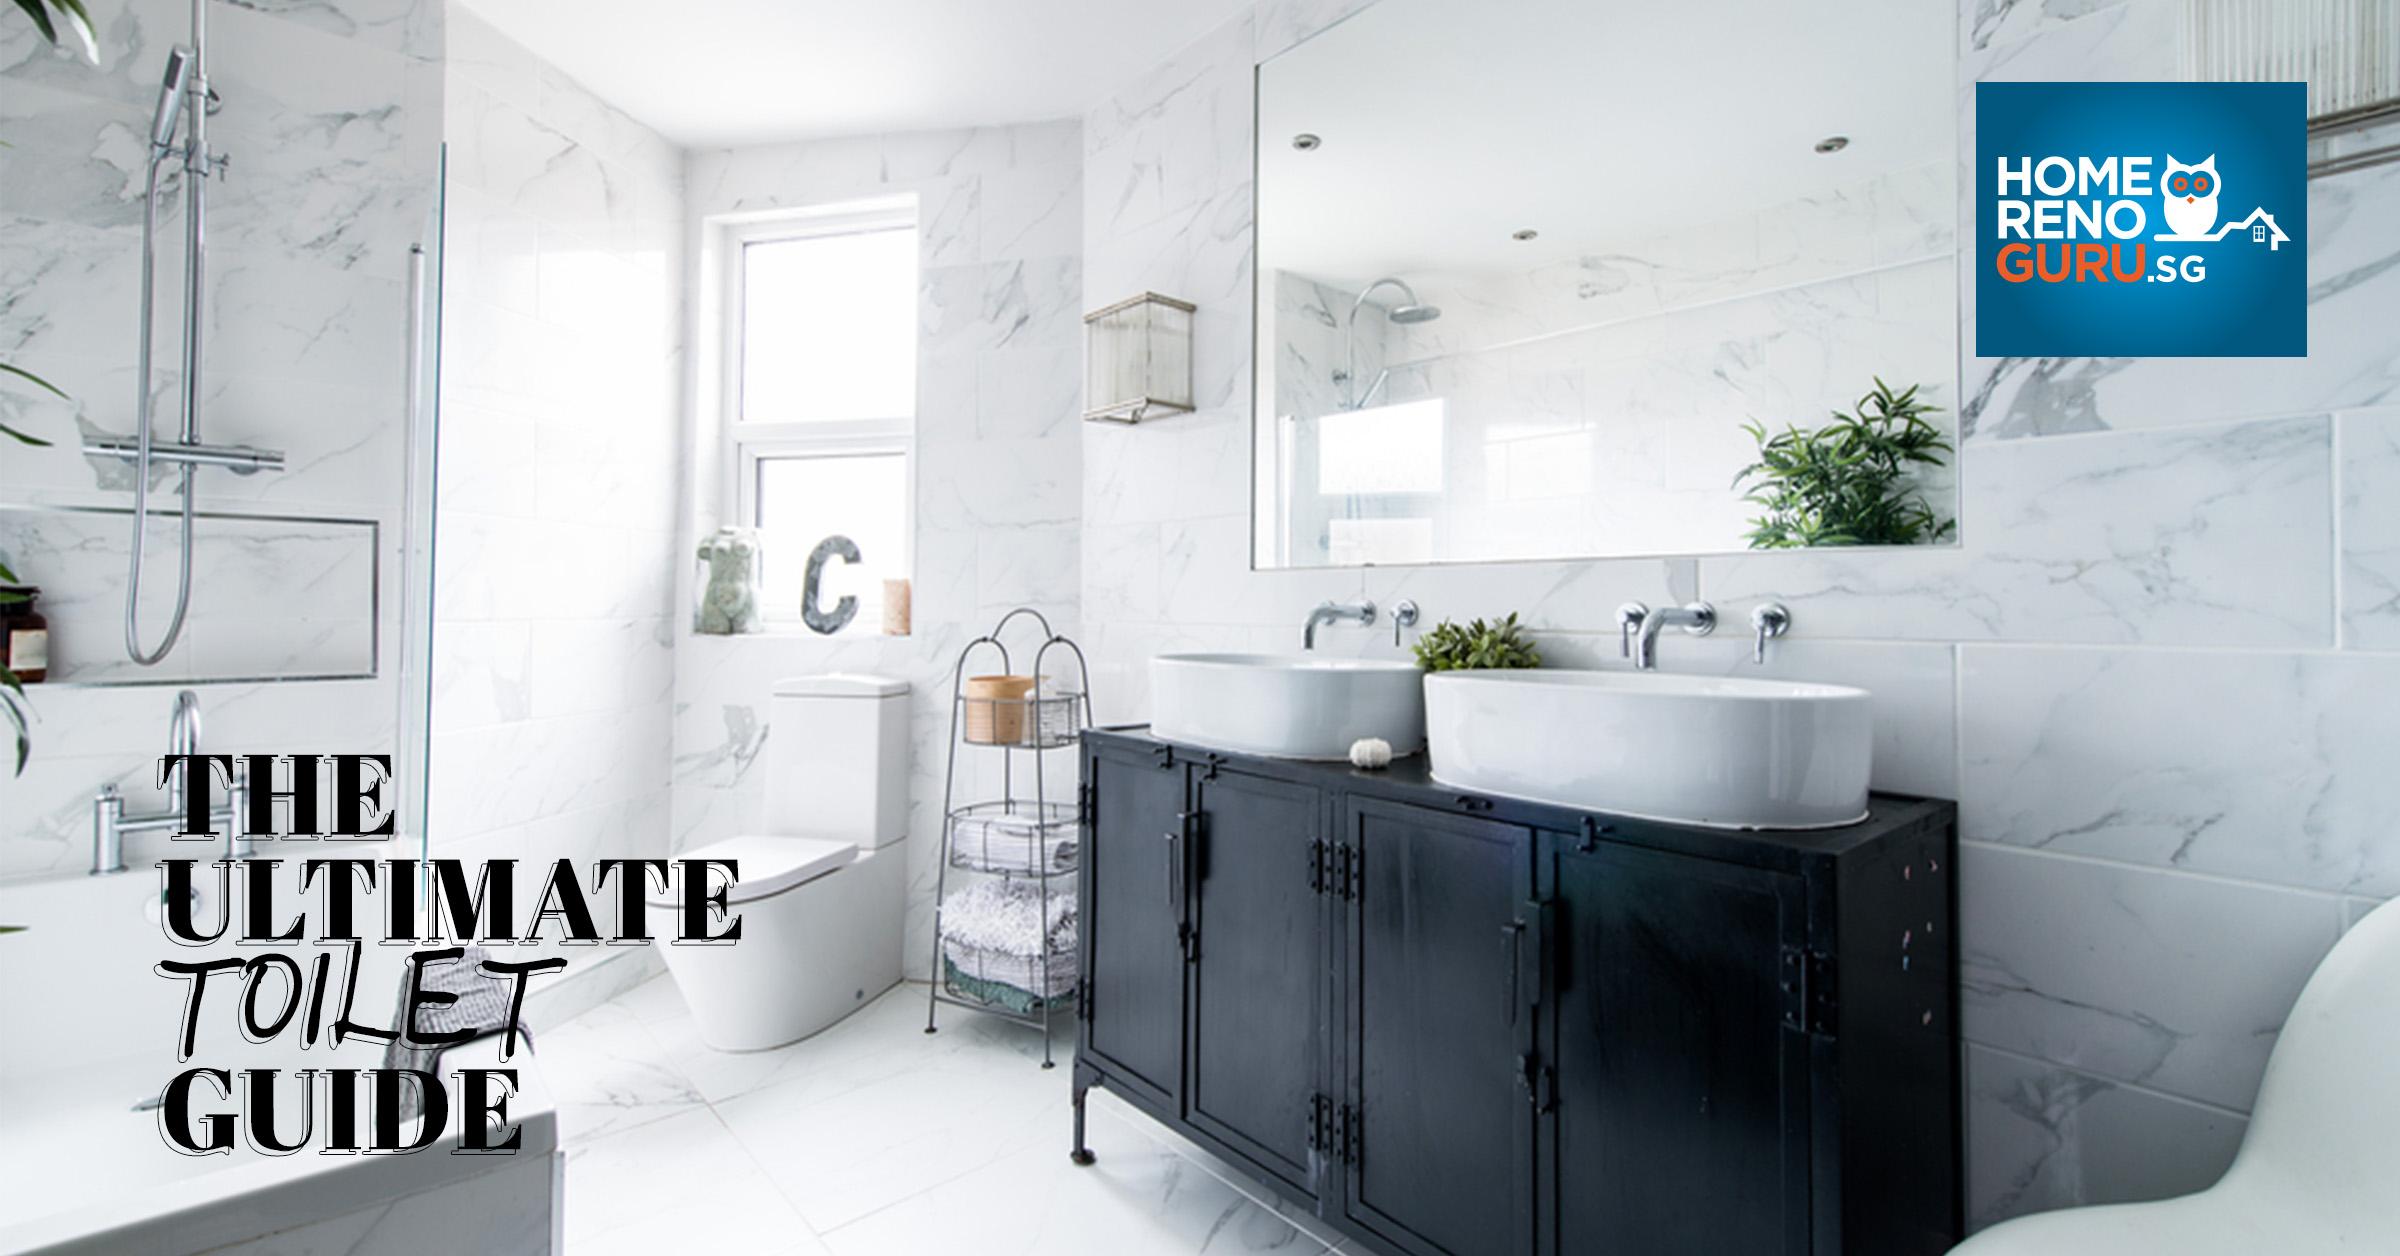 How To Avoid Leakage In Bathroom